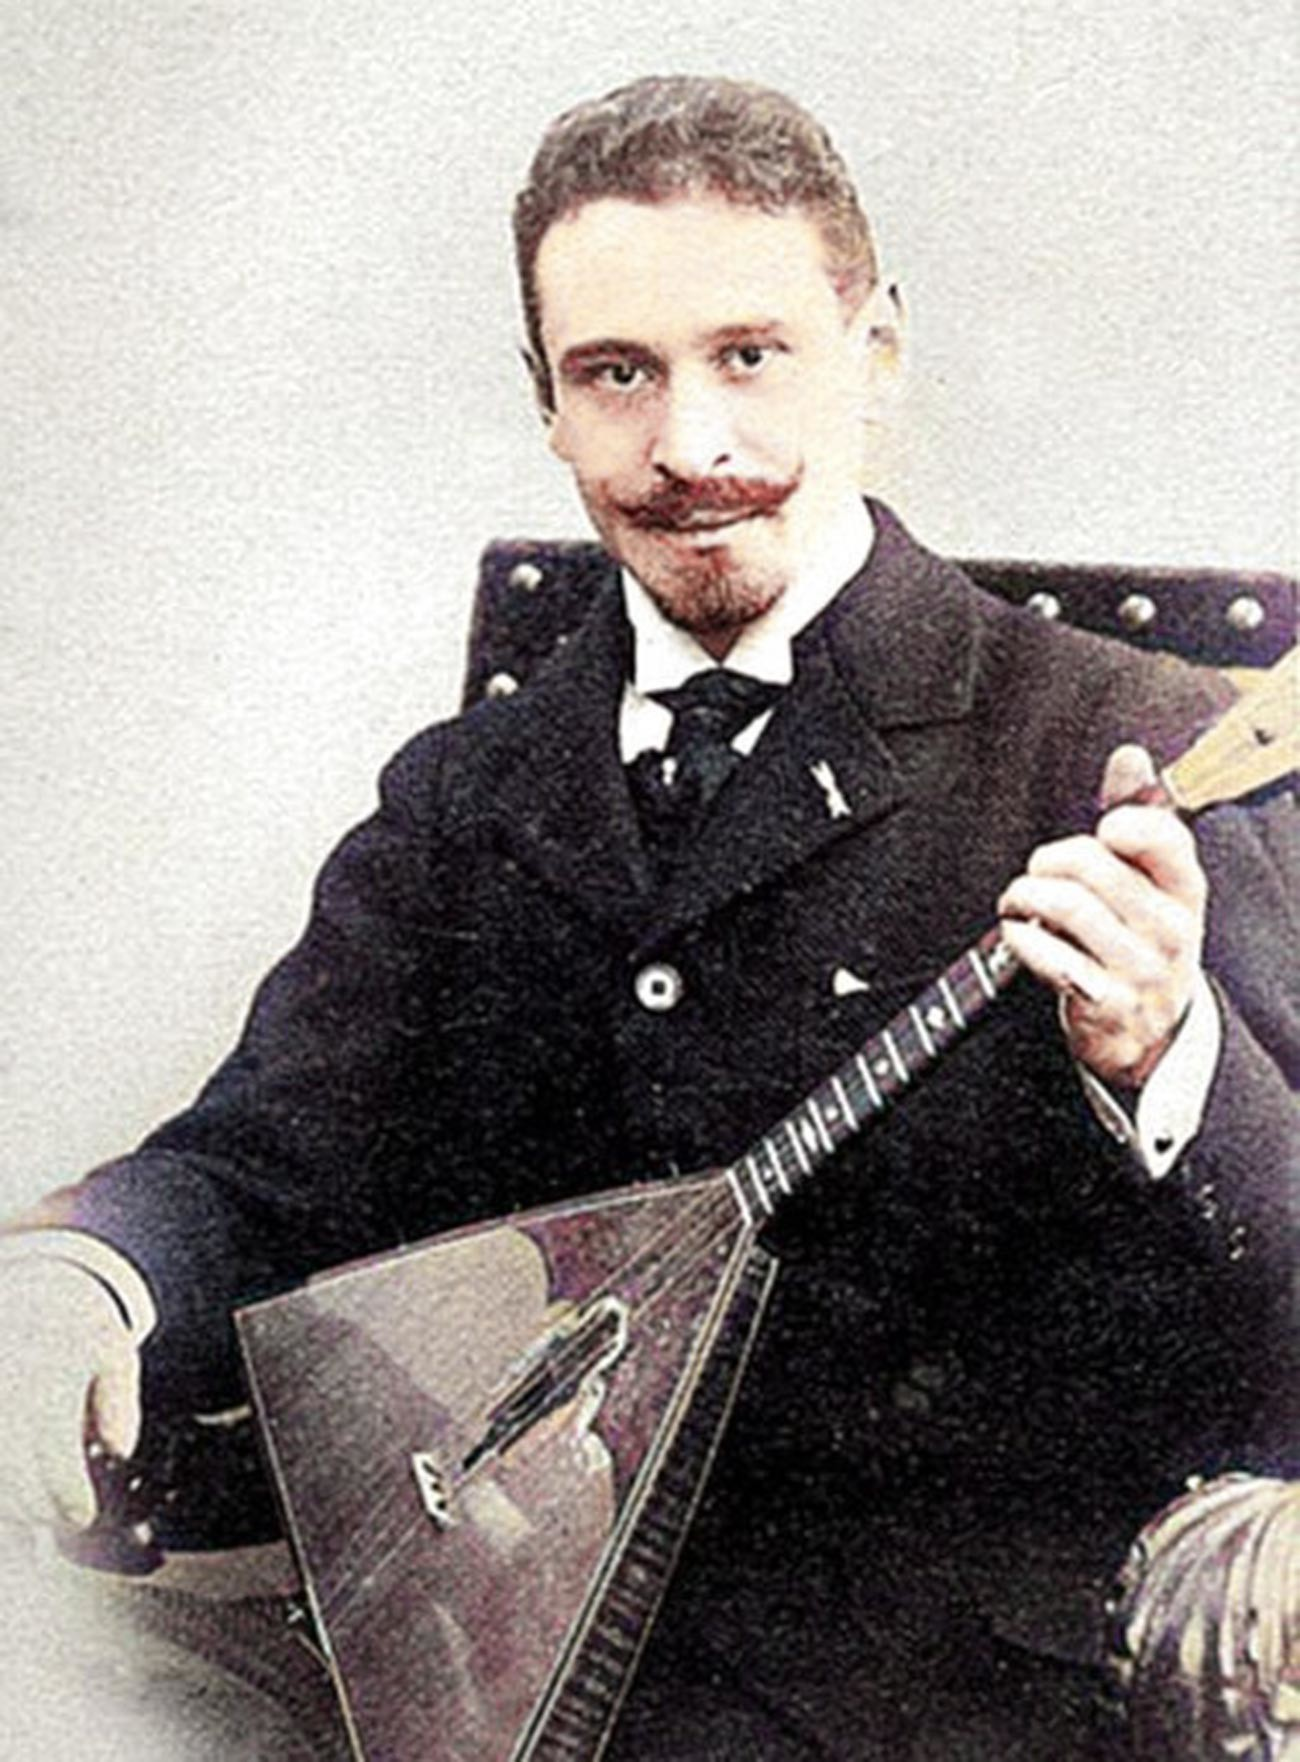 Vasiliy Andreev, the maestro of the balalaika